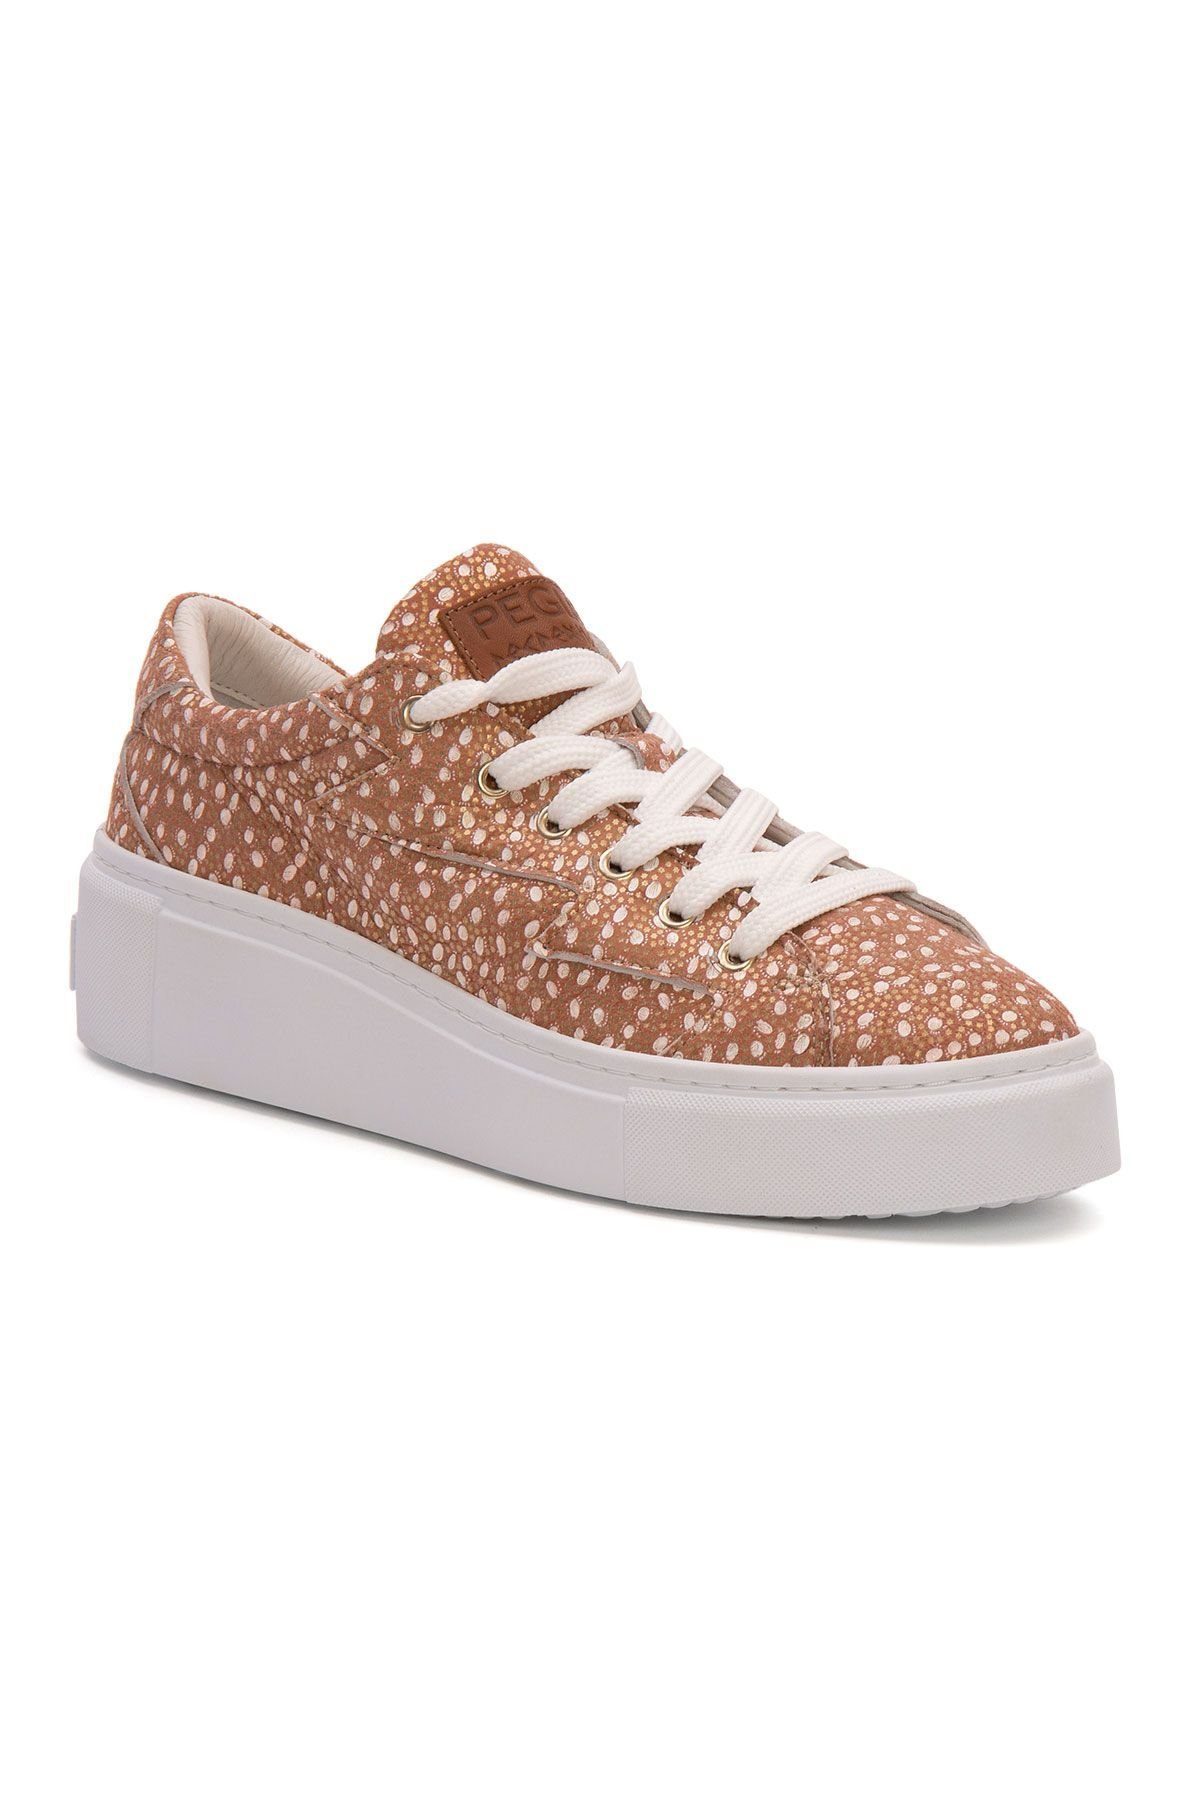 Pegia Genuine Leather Women's Sneaker LA1518 Powdery